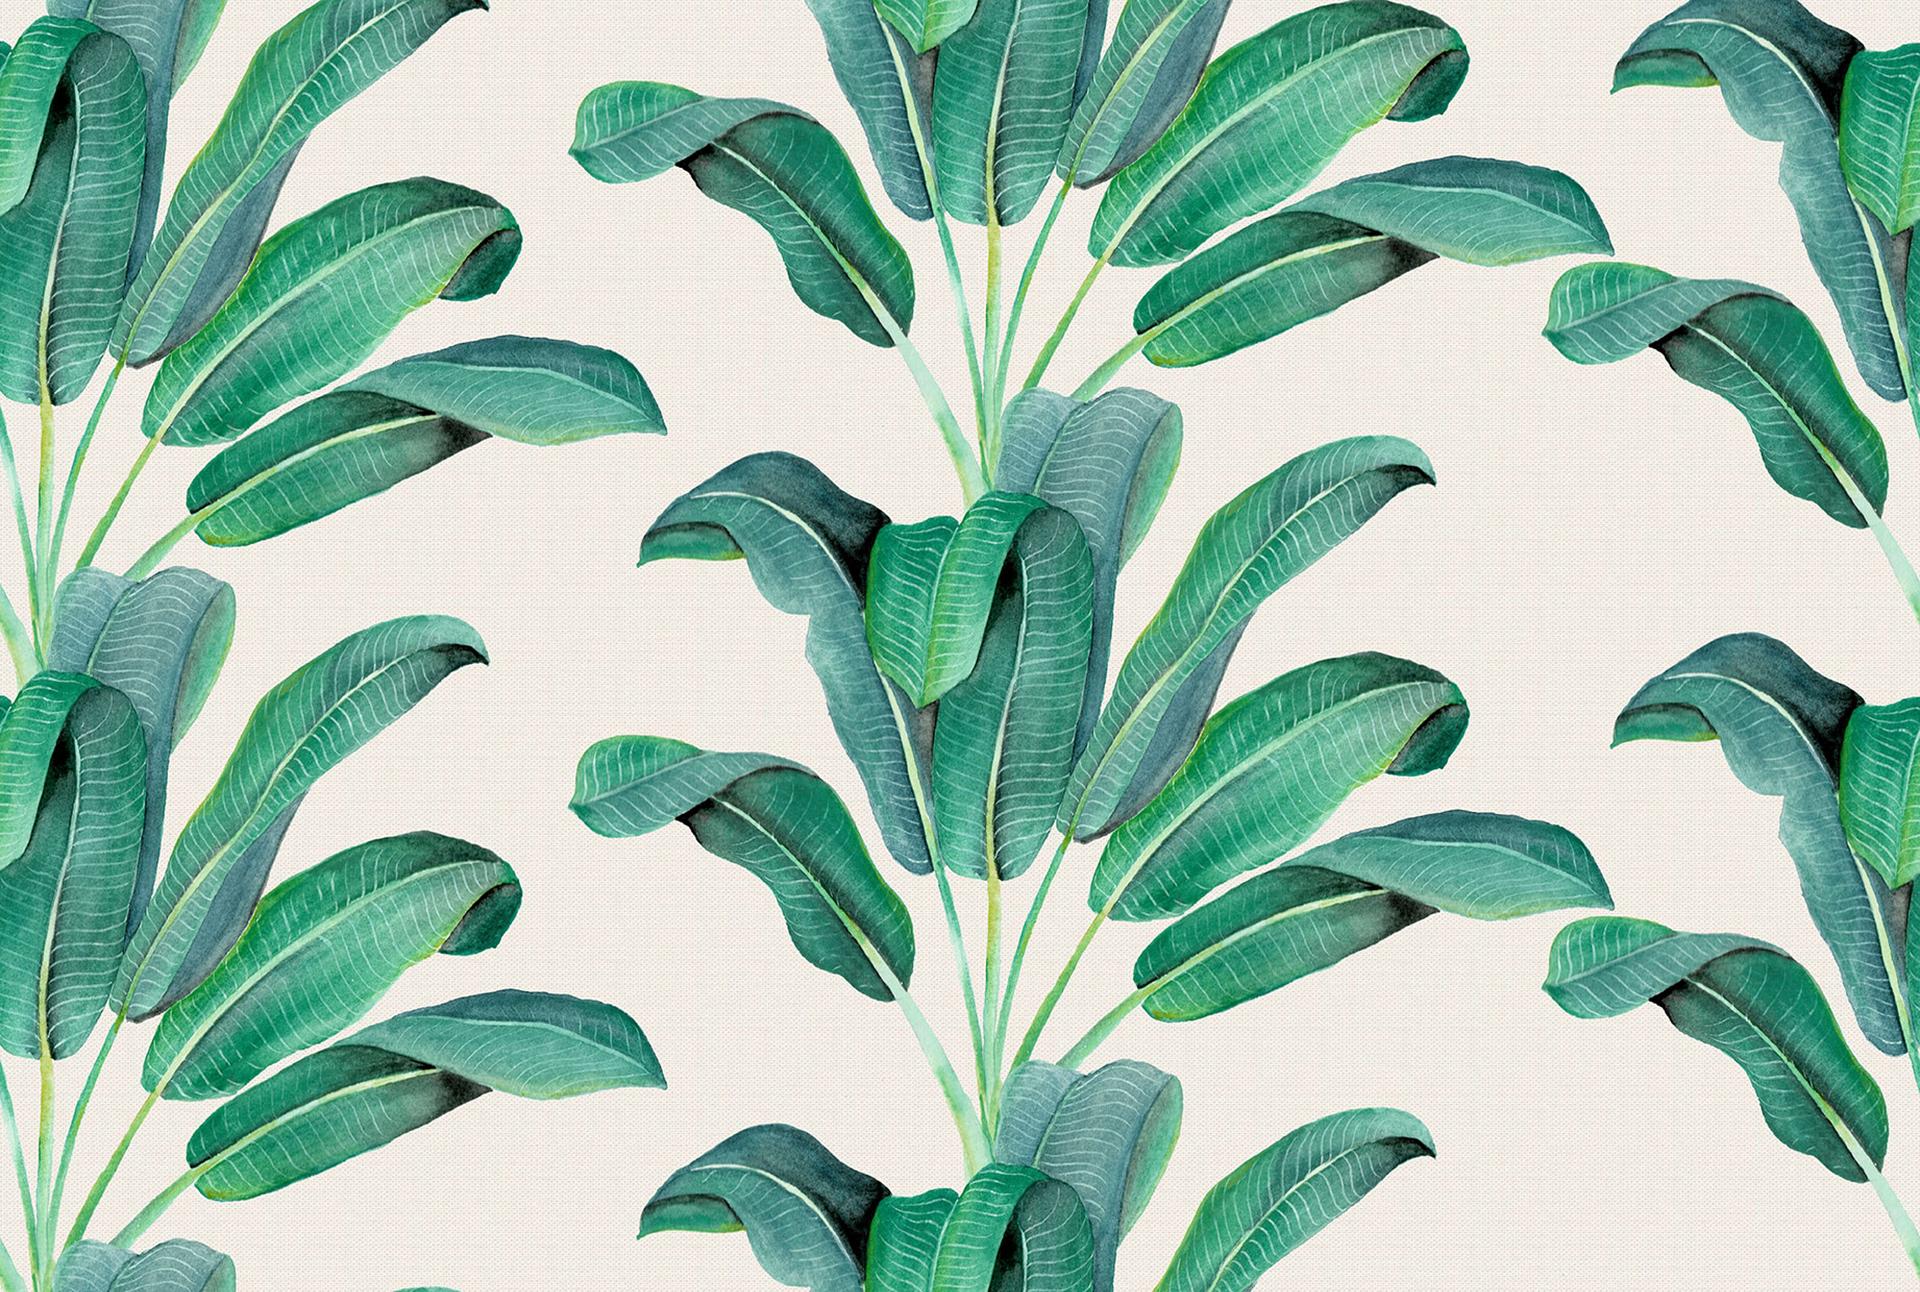 Cute Anime Watercolor Wallpapers Banana Leaf Images Free Pixelstalk Net